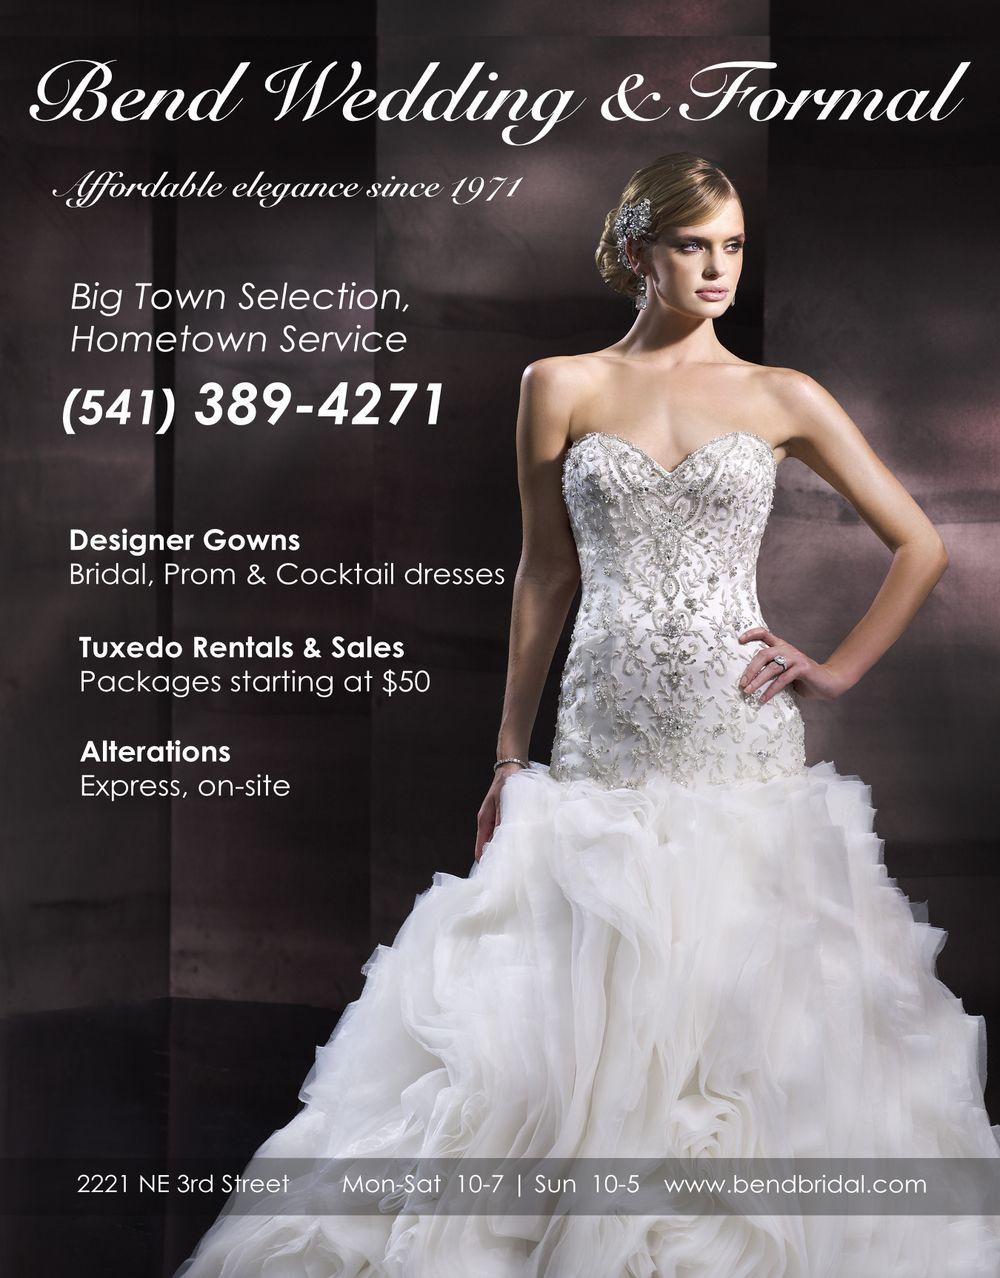 Image Result For Wedding Magazine Ad Cocktail Dress Prom Designer Gowns Wedding Dresses